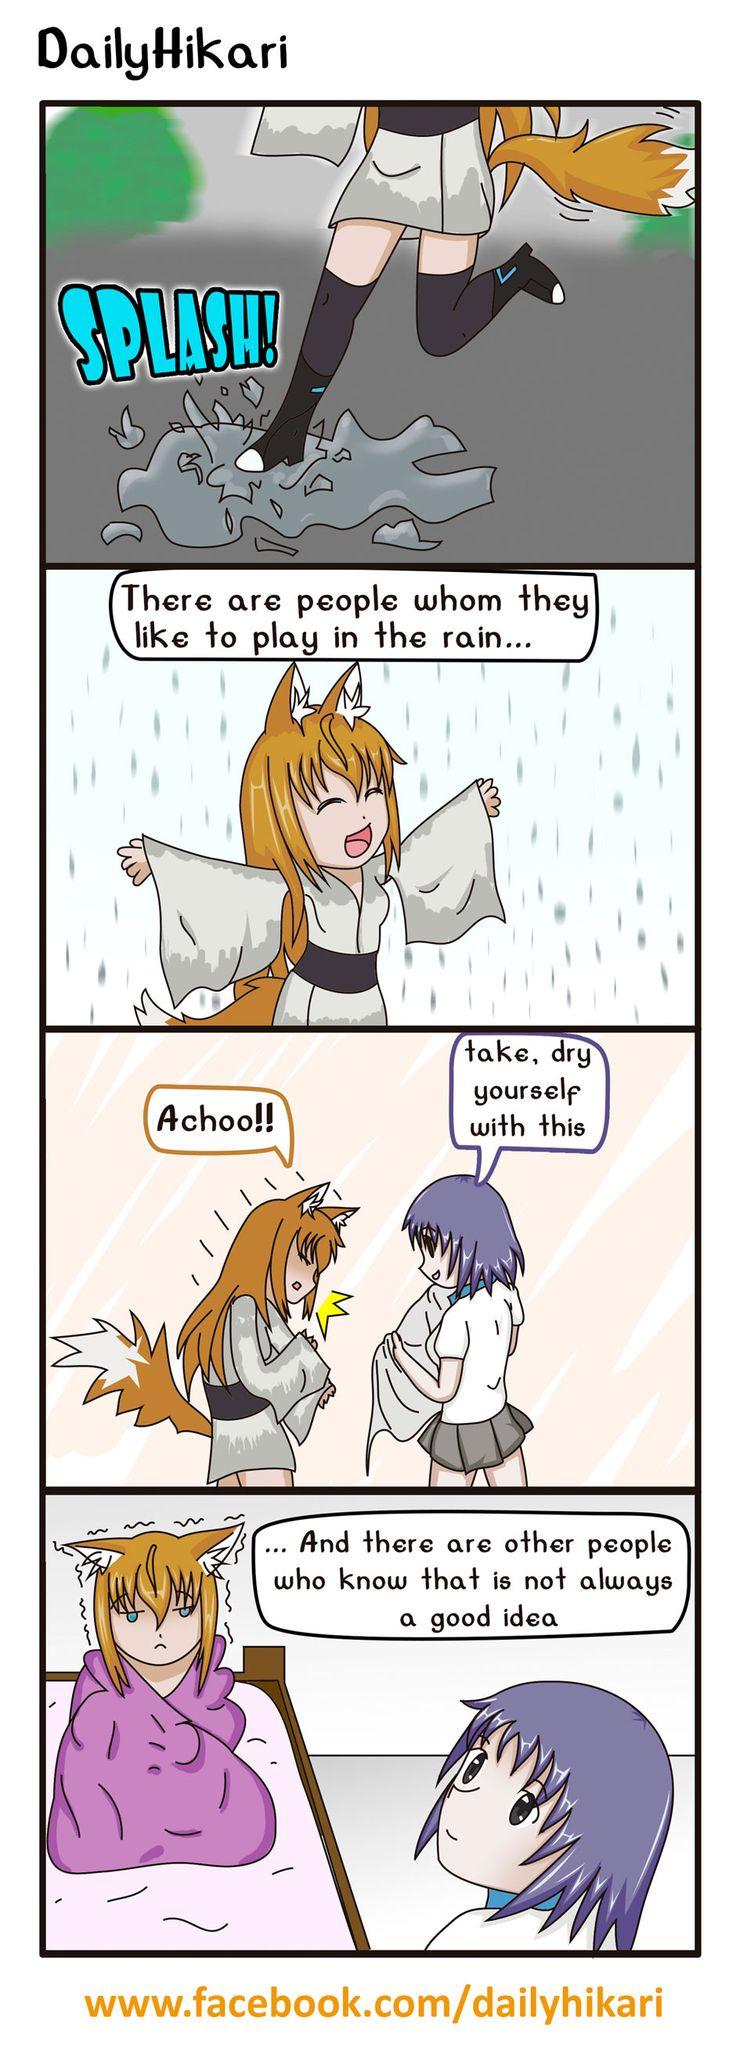 play under the rain is so funny,   ranning day, rain, kitsunemimi, kemonomimi, 4koma, webcomic, dailyhikari